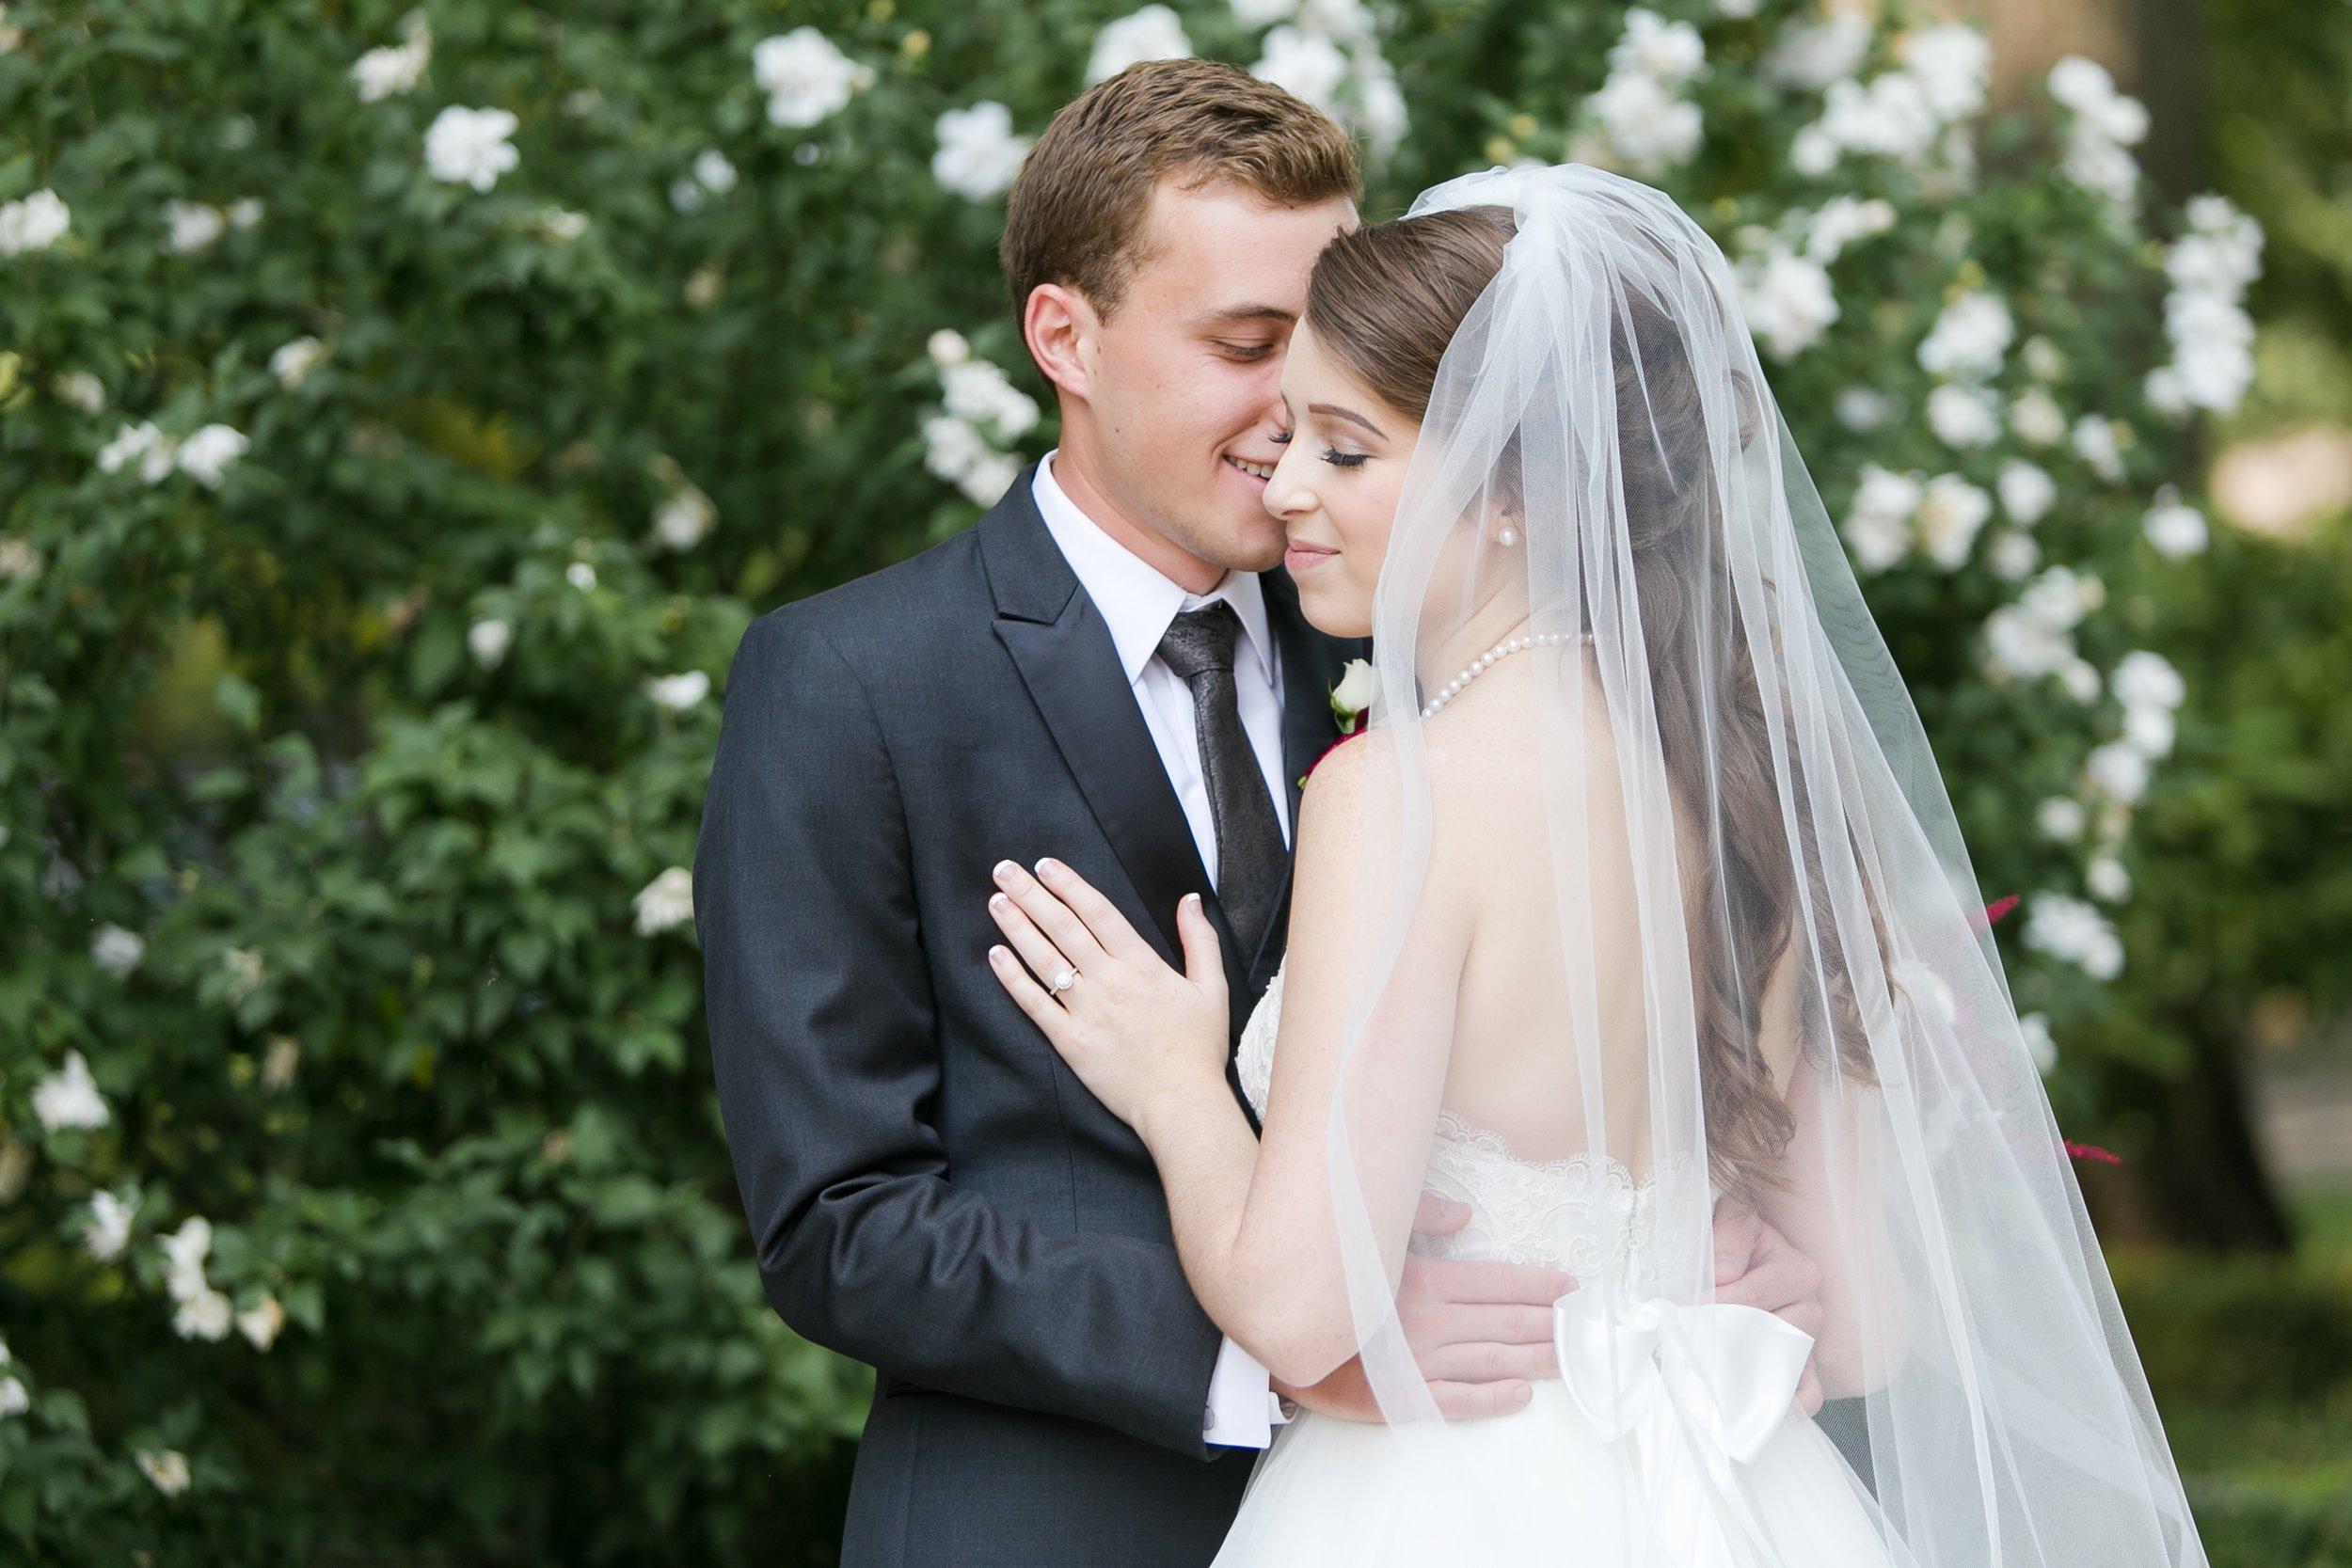 2017Sept9-Kay-Wedding-MissionTheatre-0131.jpg